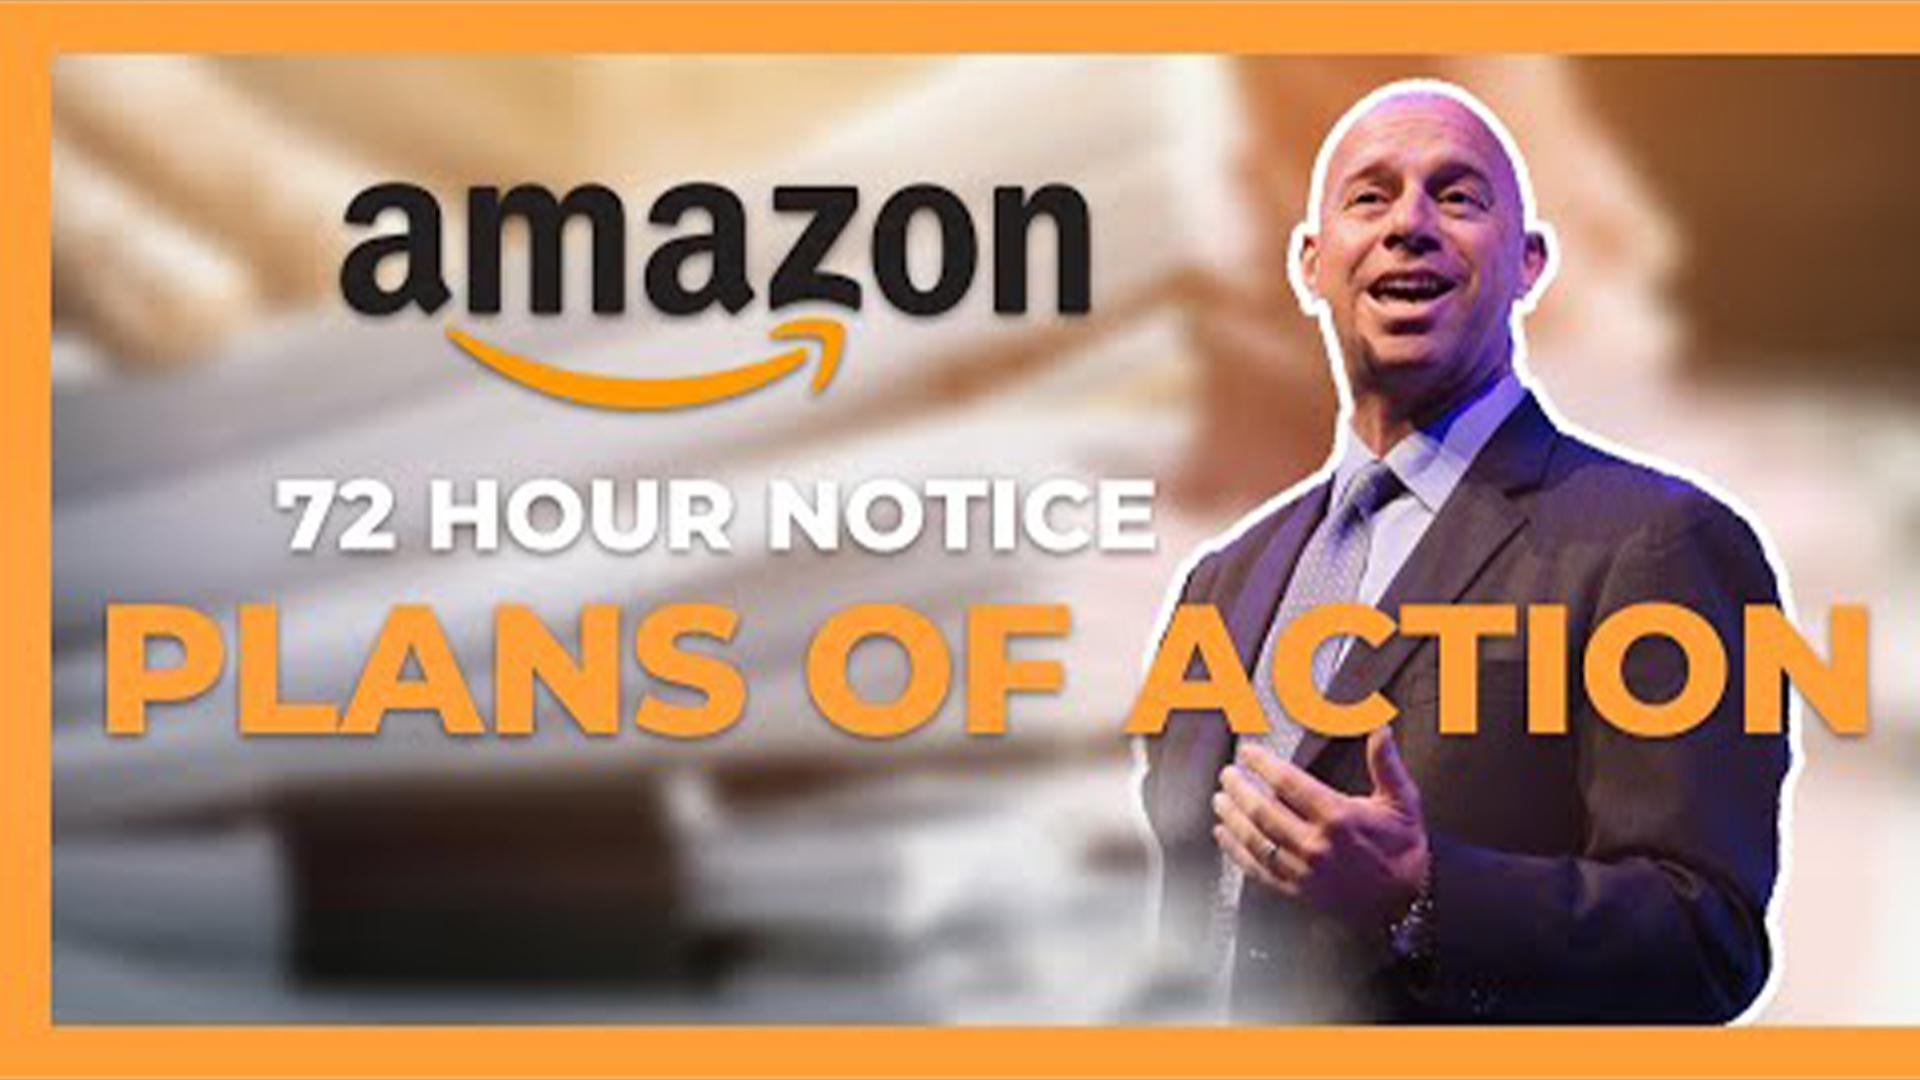 Amazon Sellers Lawyer - Zantac Recalled by FDA